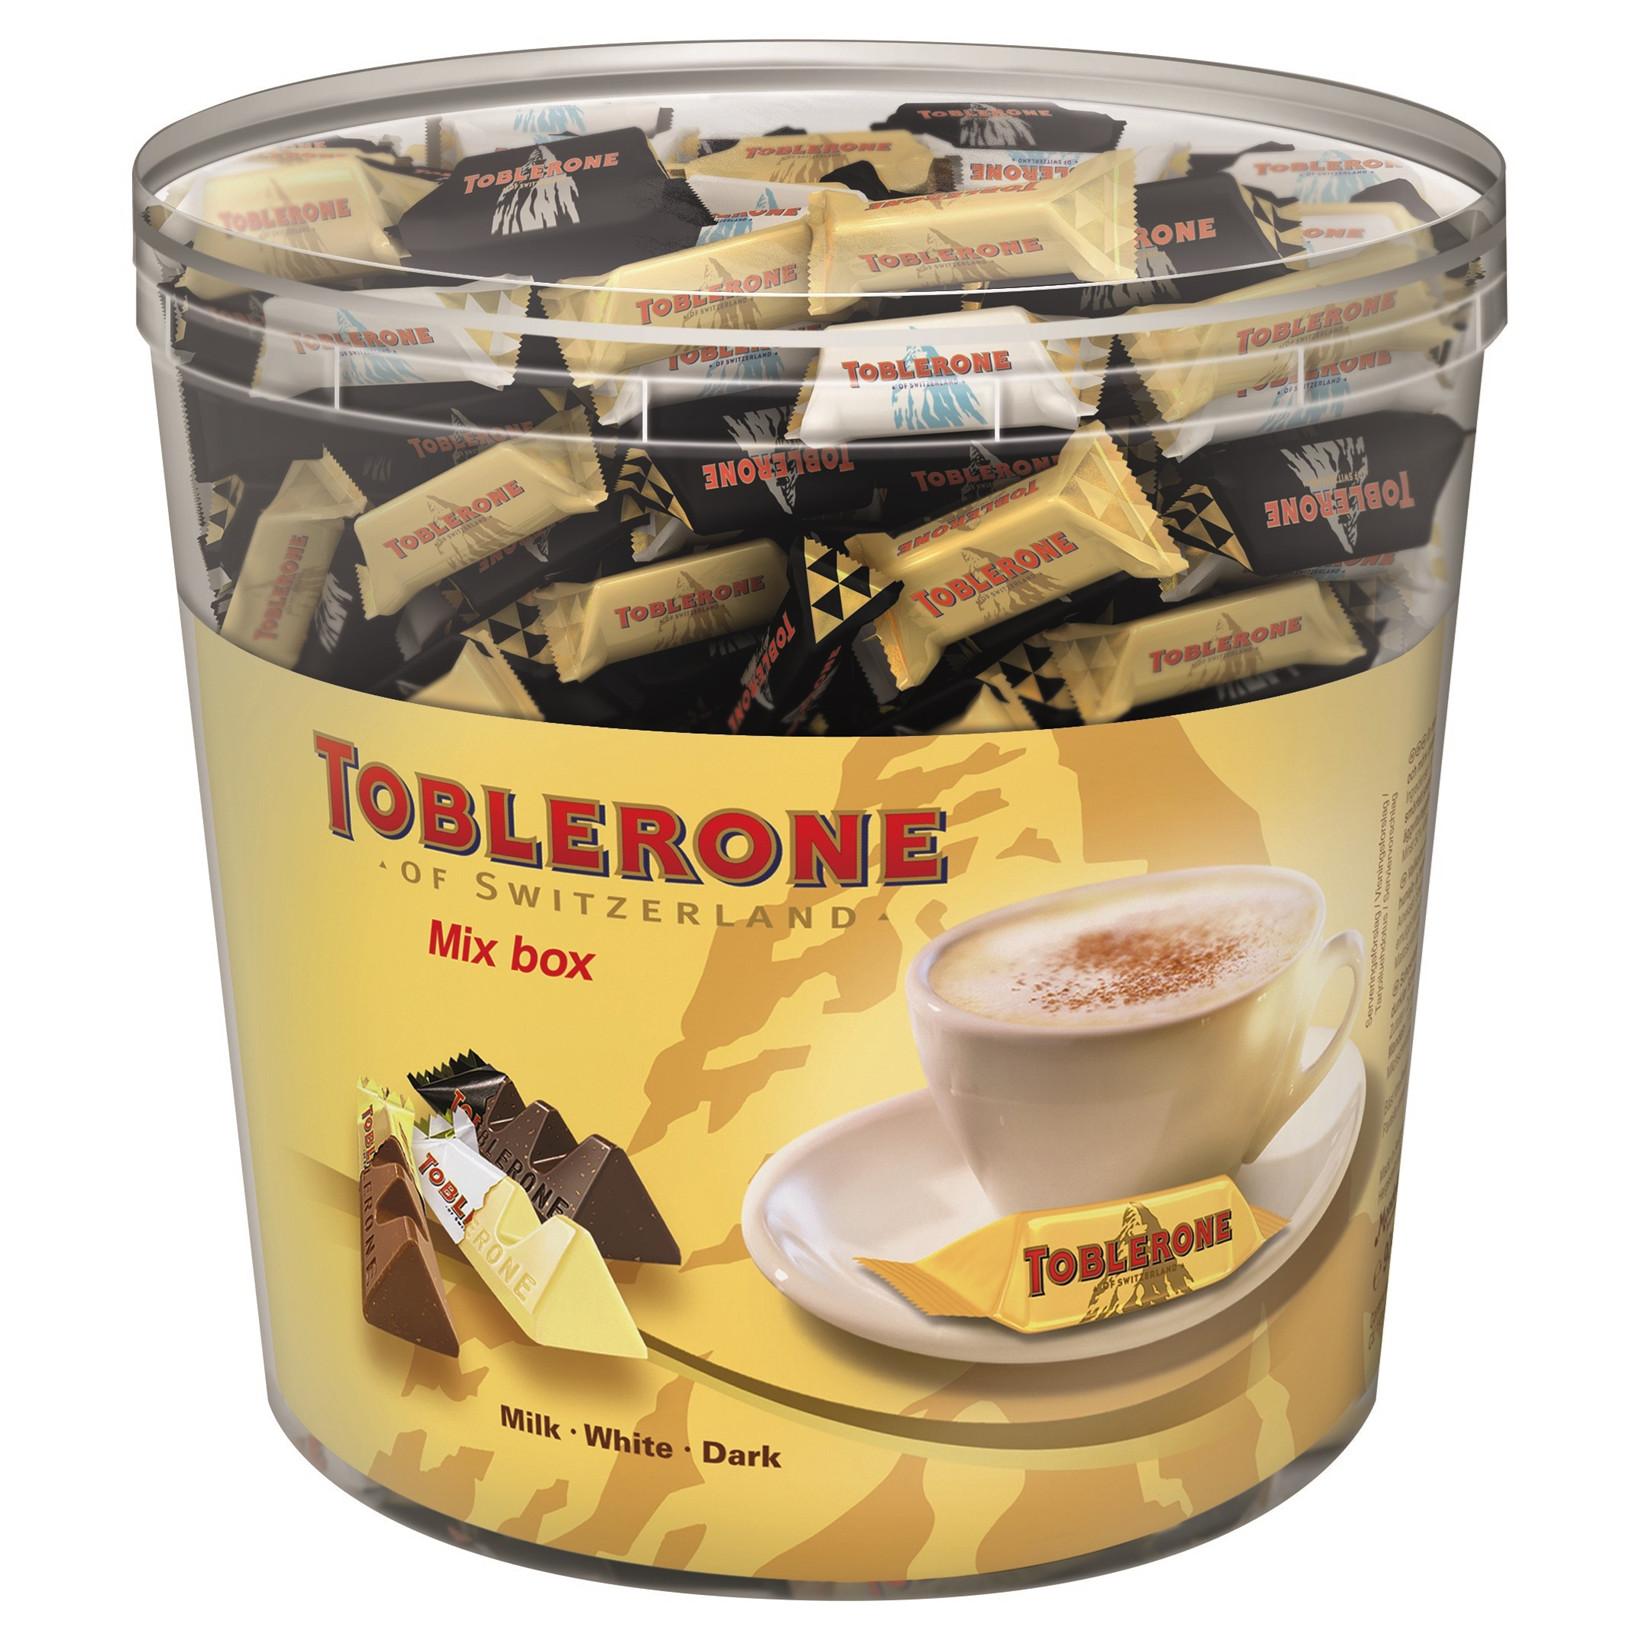 Chokolade Toblerone Tiny mix - 904 gram i pakken